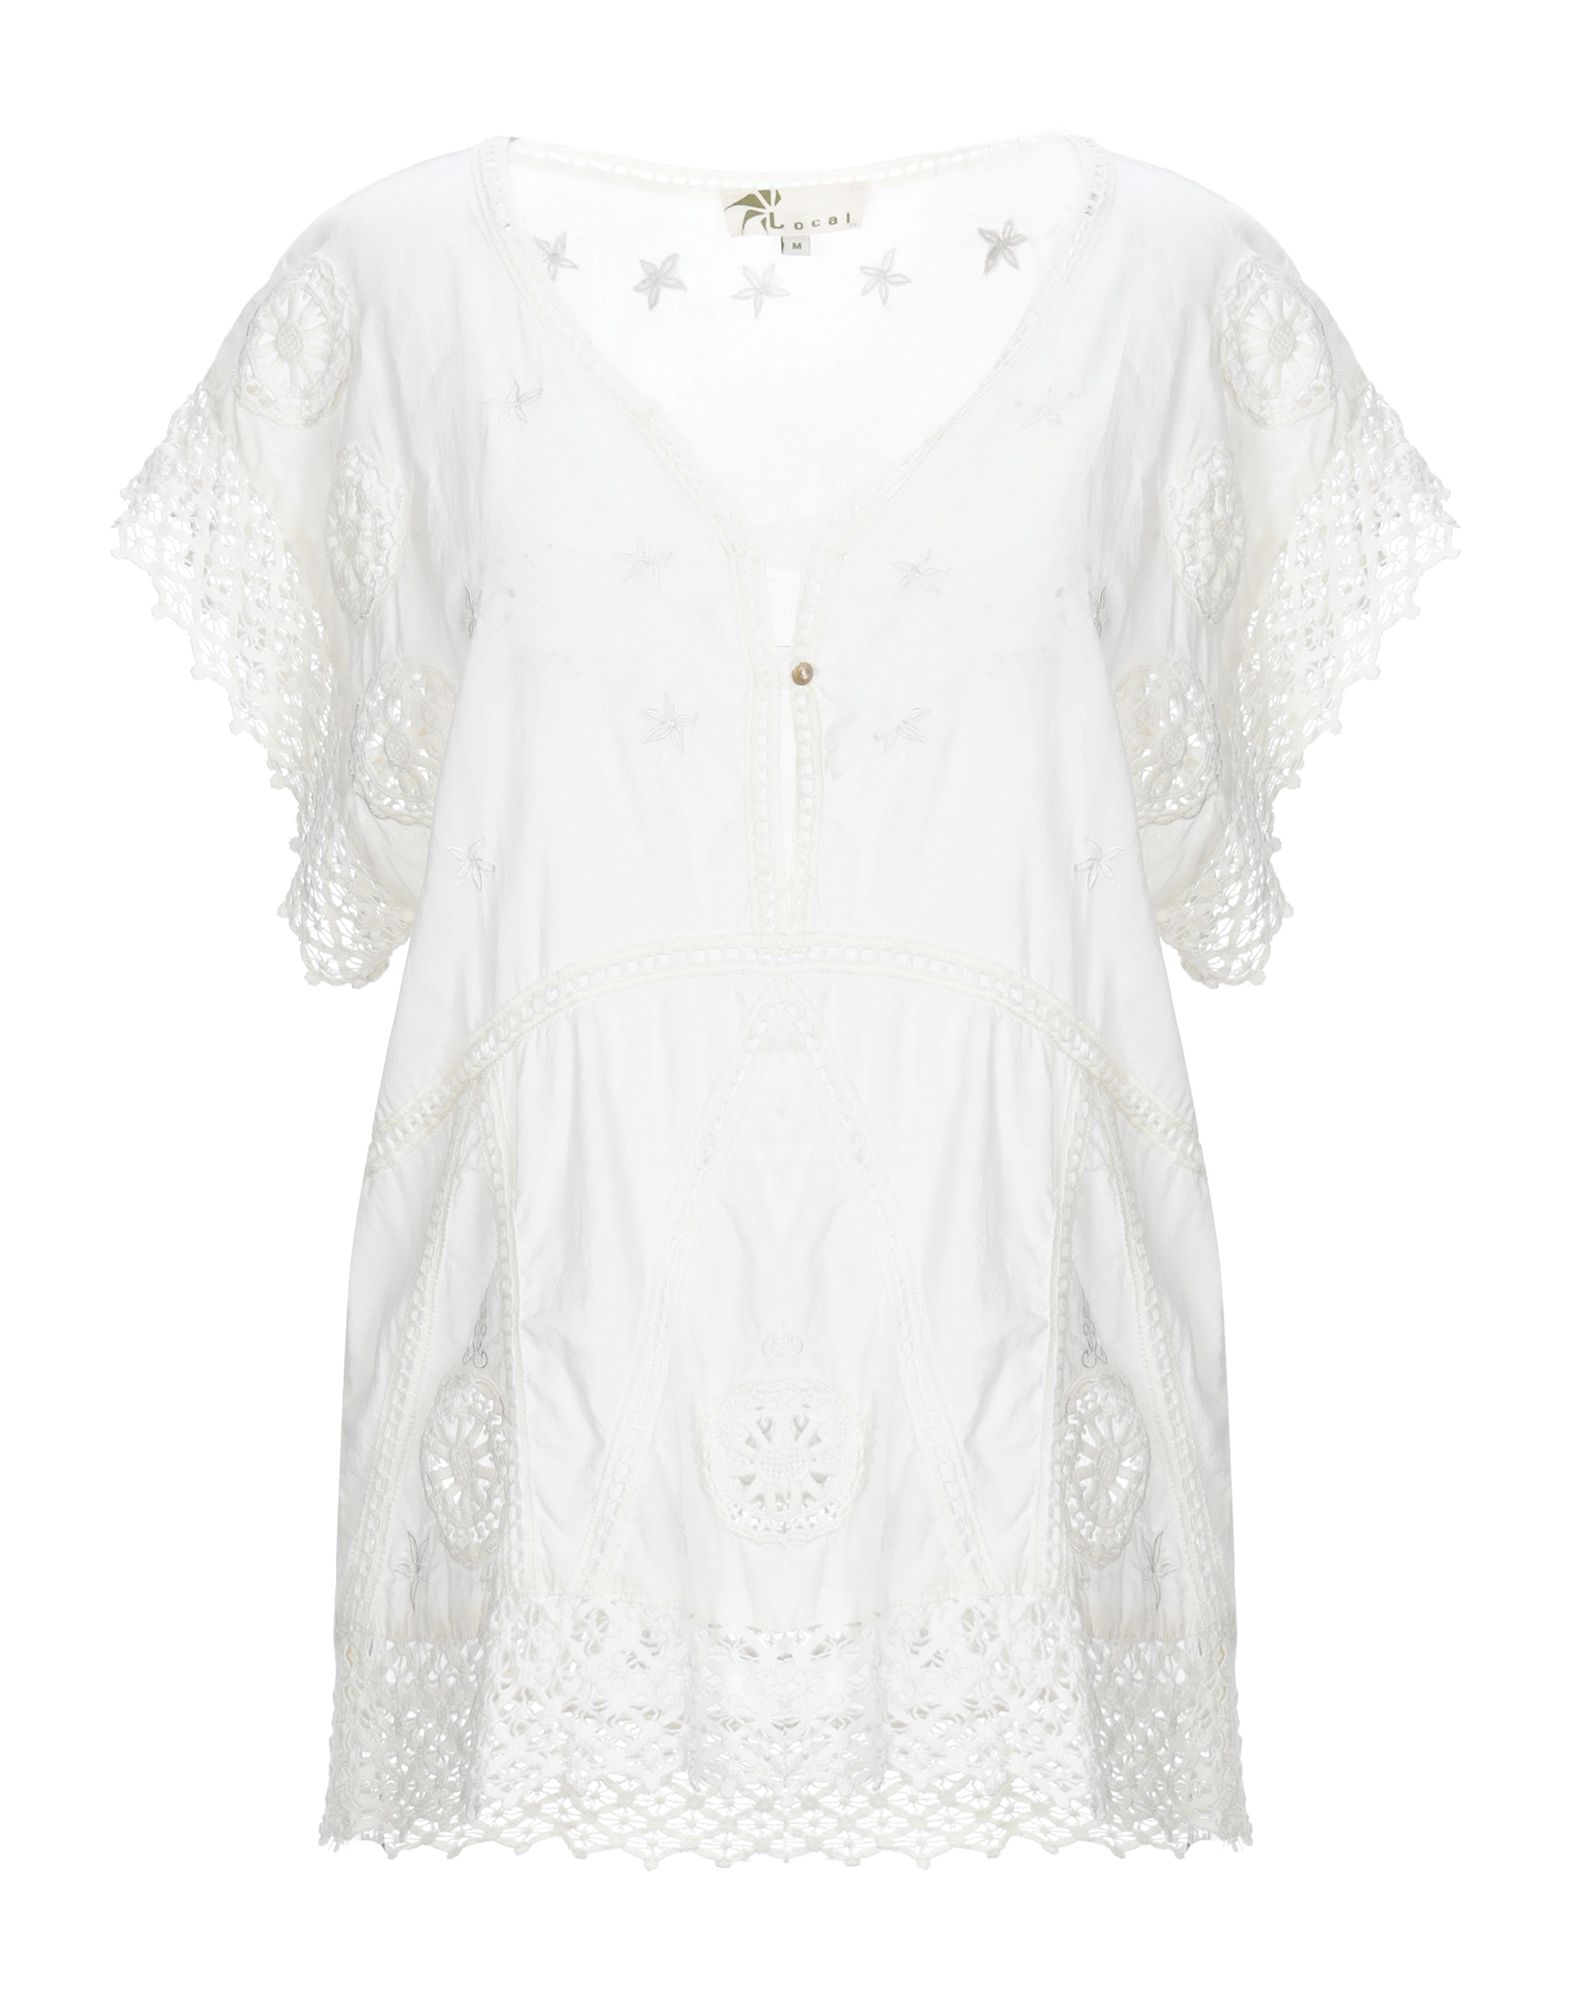 LOCAL APPAREL Блузка local apparel платье до колена